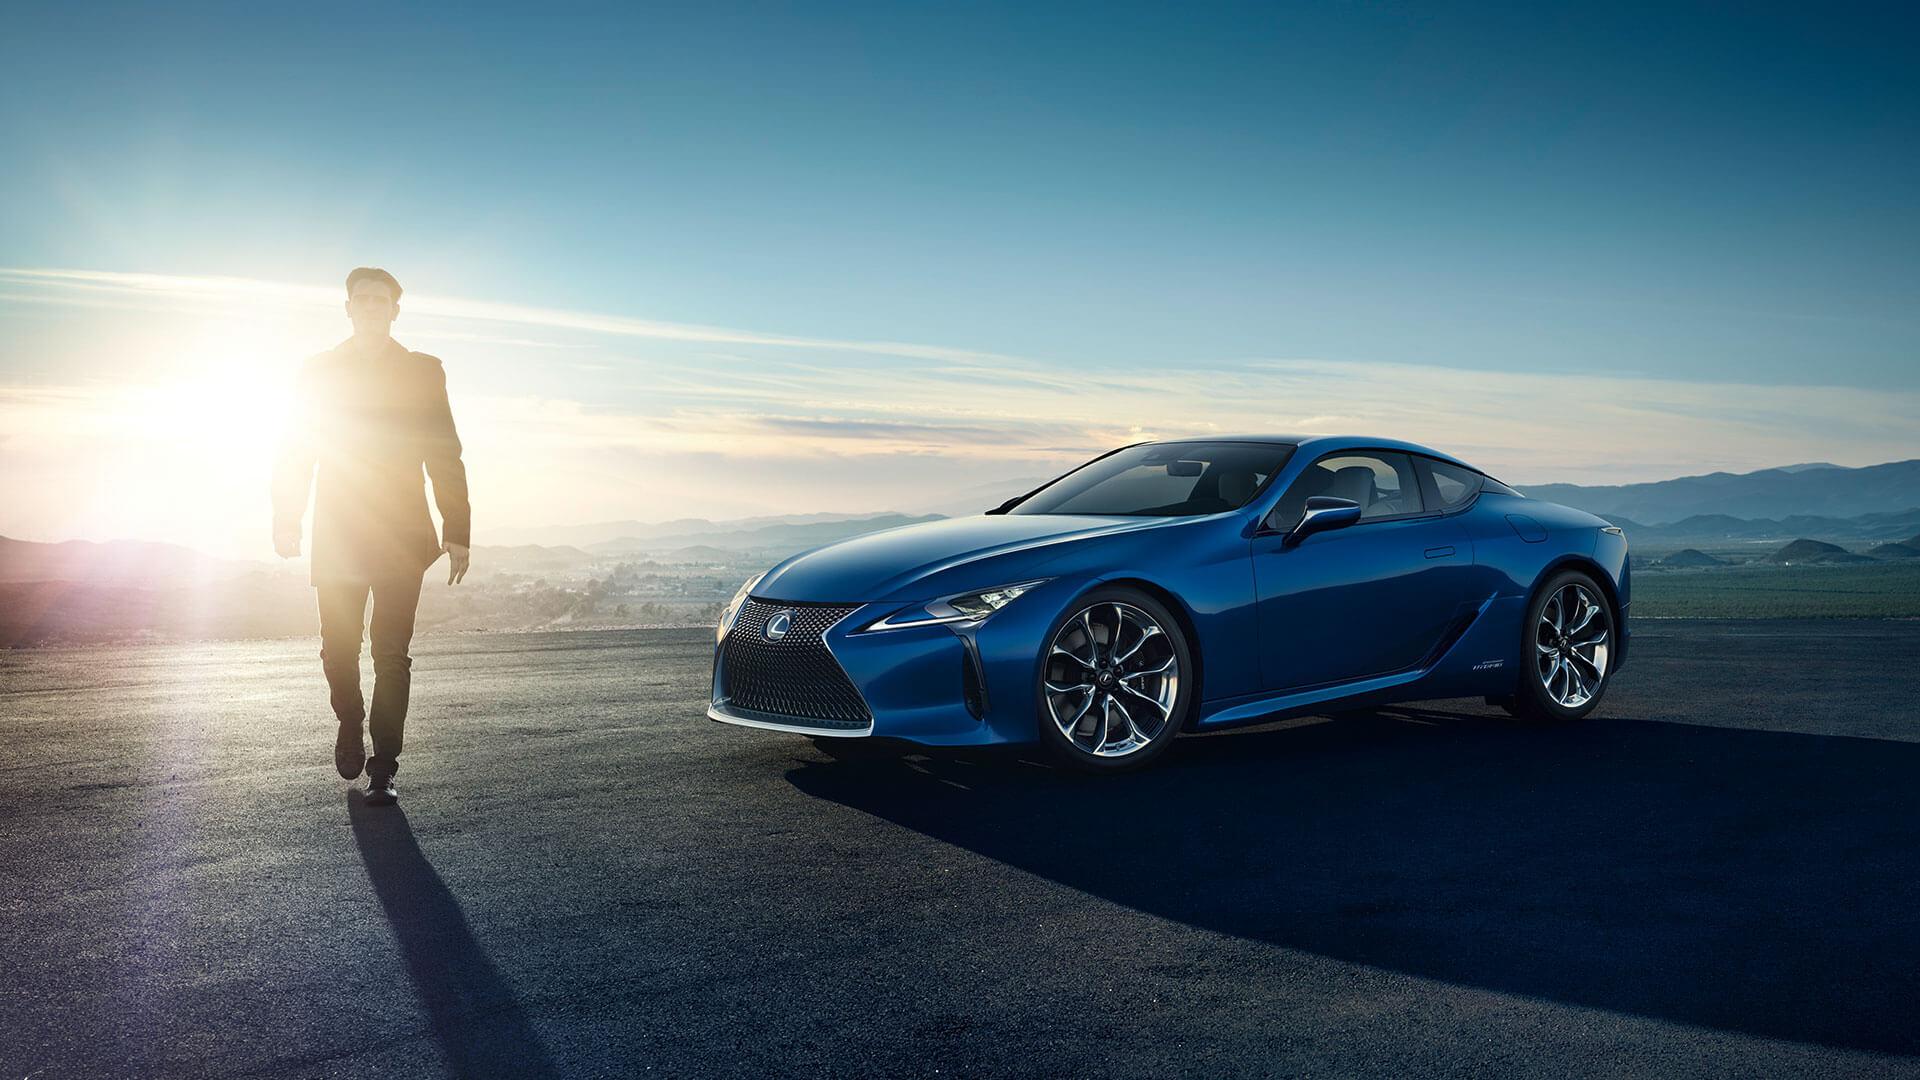 Blue Lexus & Man